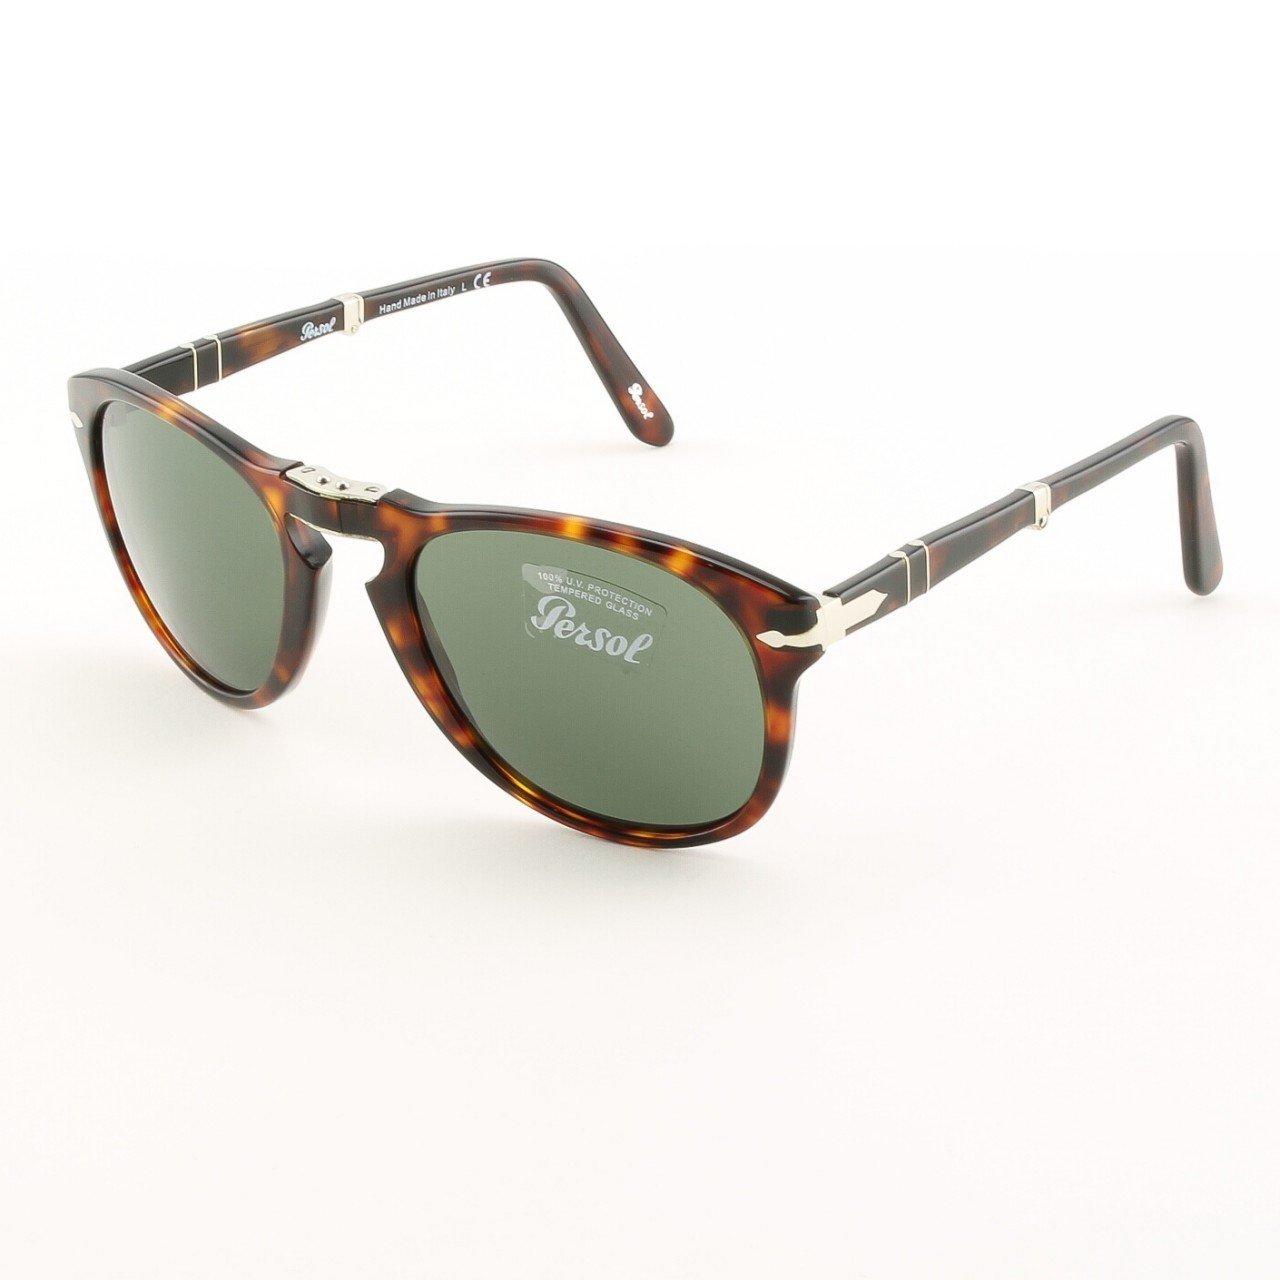 Persol PO0714 24/31 54mm Sunglasses Havana w/ Green Grey Crystal Lenses 714 NWT